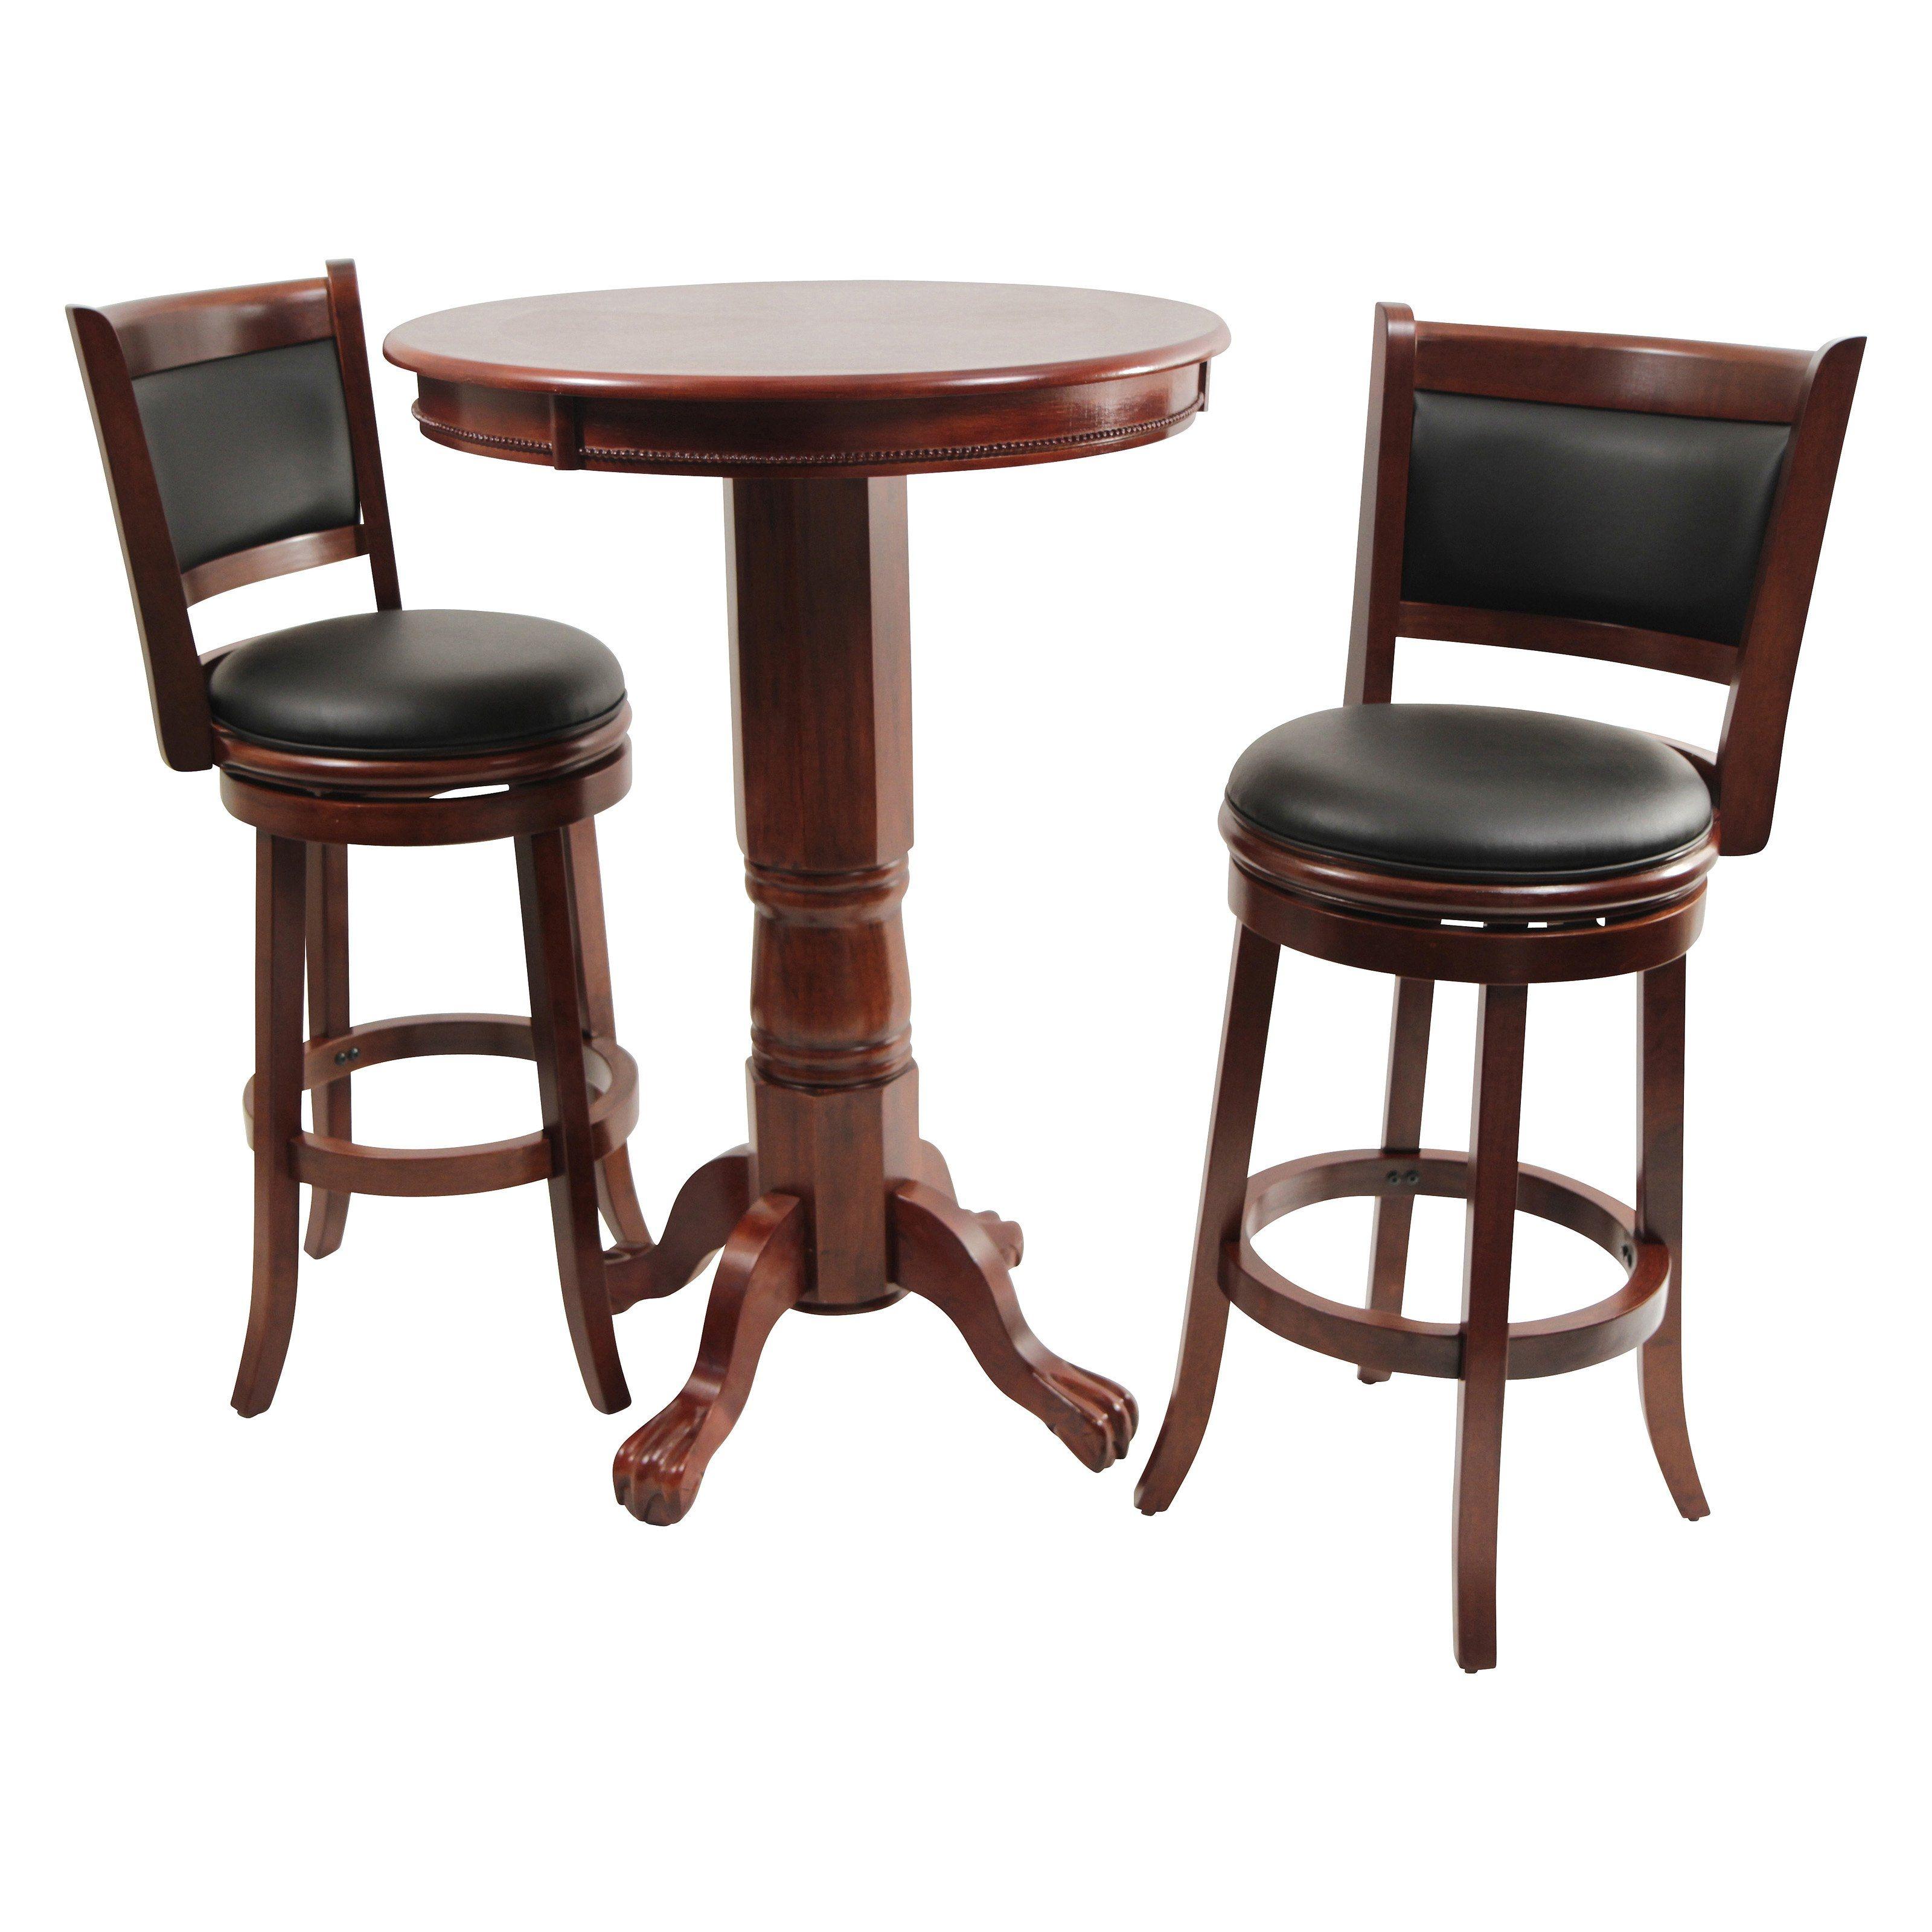 pub table sets http lachpage com pinterest pub table sets rh pinterest co uk Dining Pub Table Sets Black Pub Table and Chairs